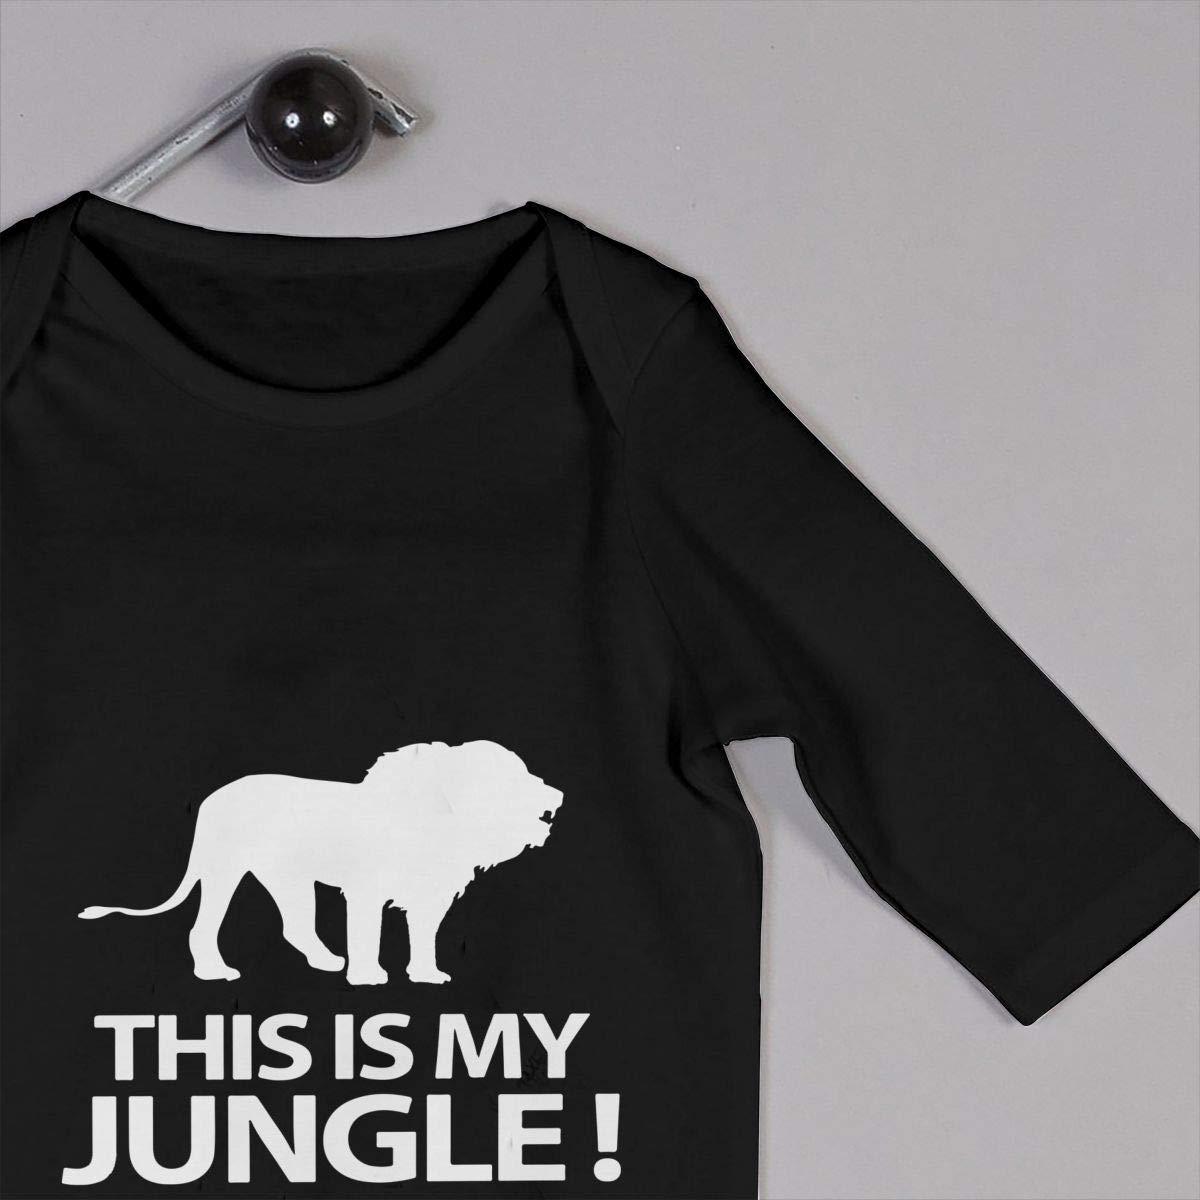 Db84UR@5p Infant Baby Girls Boys Long Sleeve Bodysuit Comfortable This is My Jungle Cotton Crawler